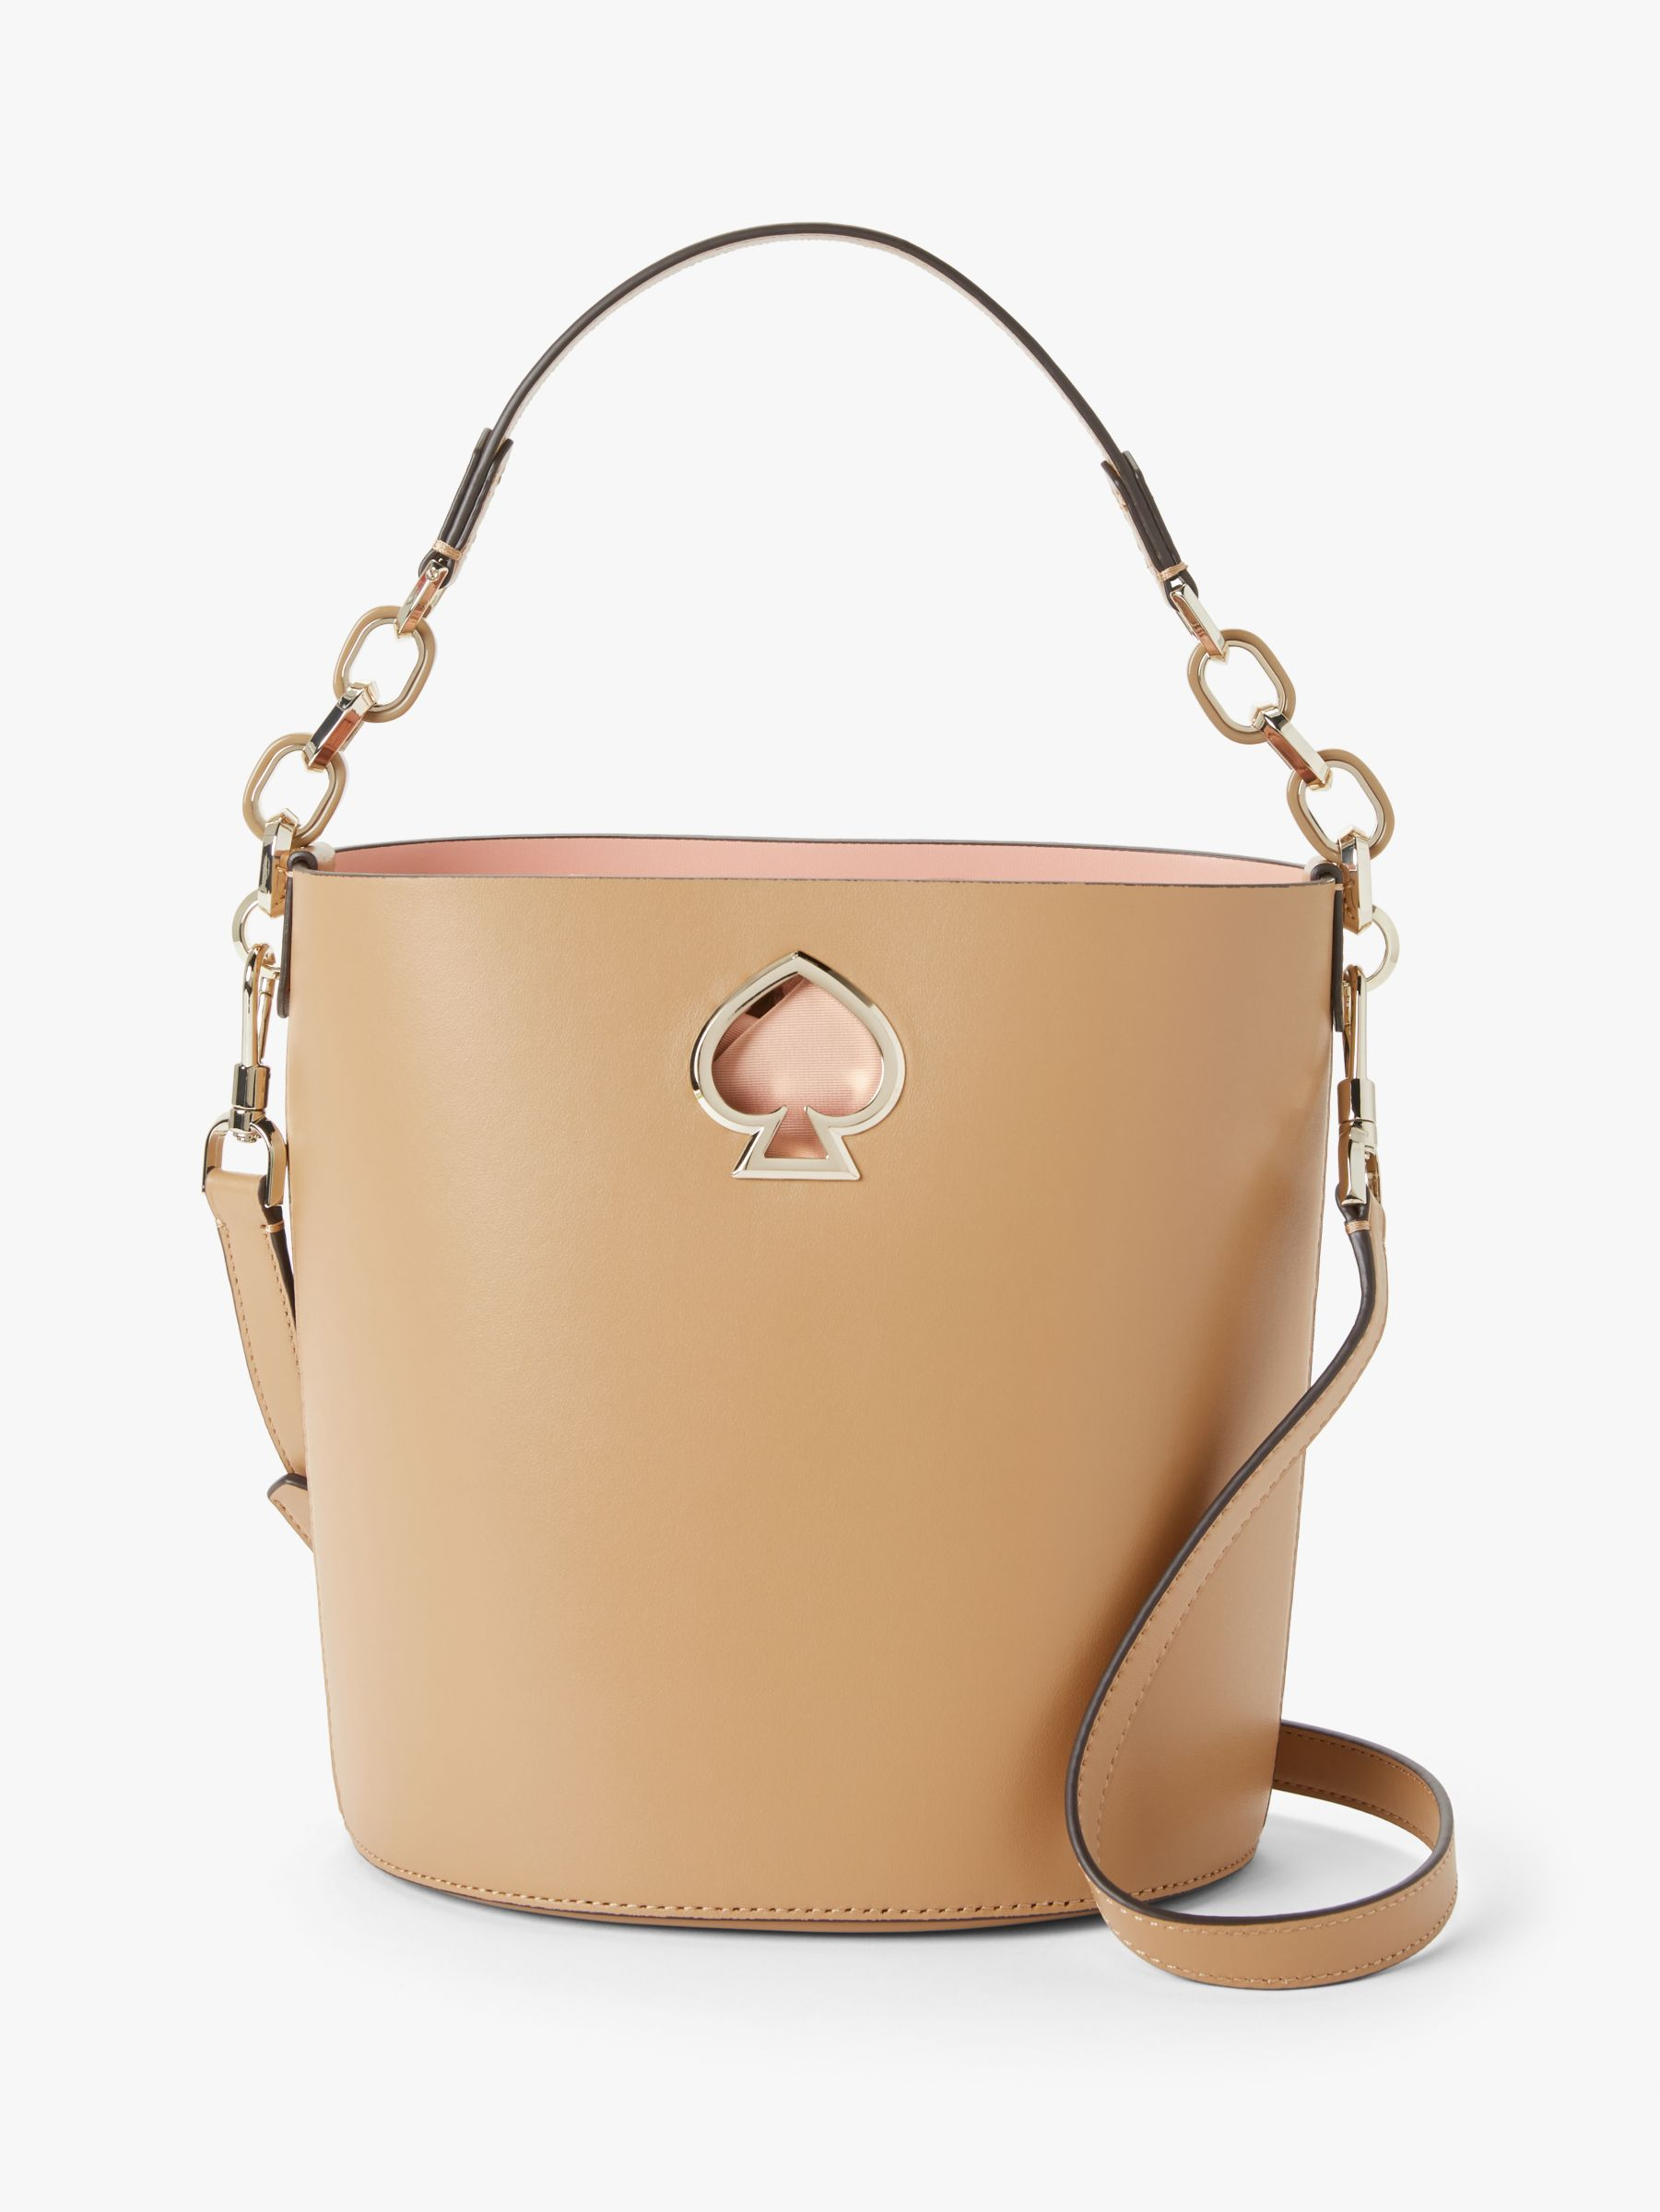 94d3da80ade1 kate spade new york Suzy Small Leather Bucket Bag at John Lewis & Partners